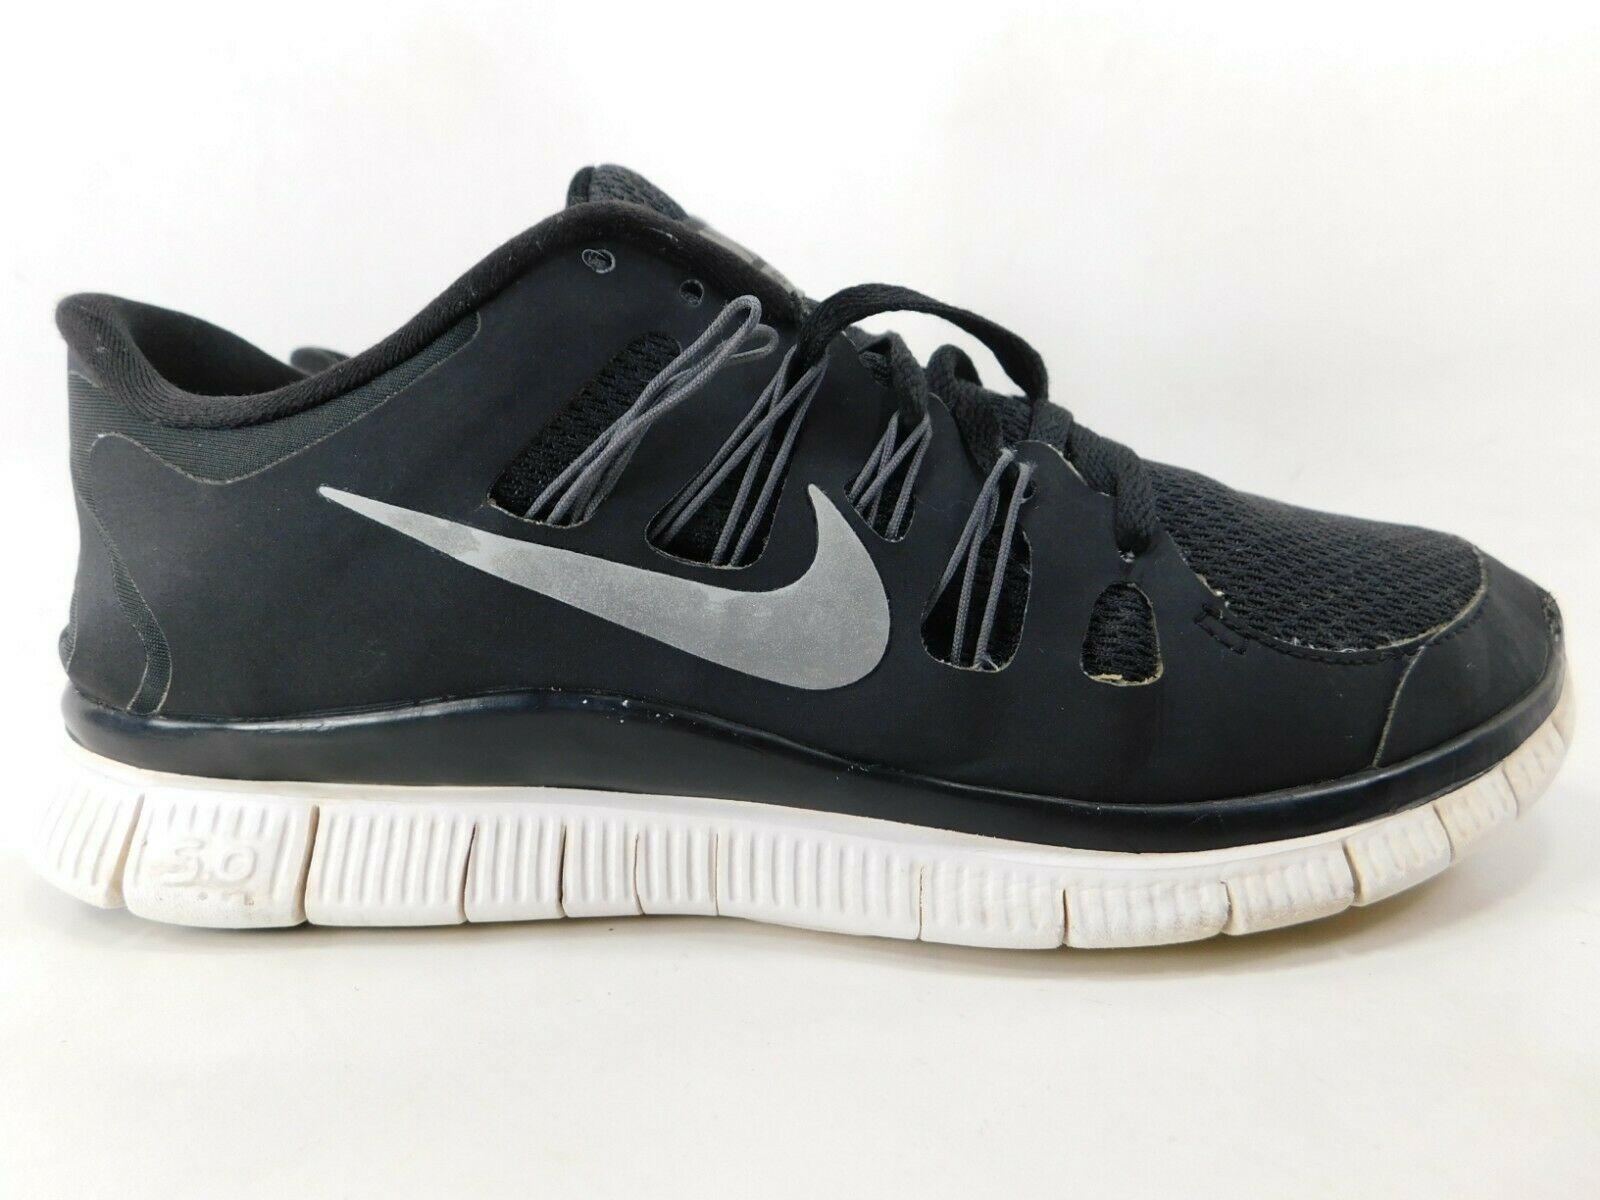 Nike Free 5.0+ Size US 9.5 M (D) EU 41 Women's Running Shoes Black 580591-002